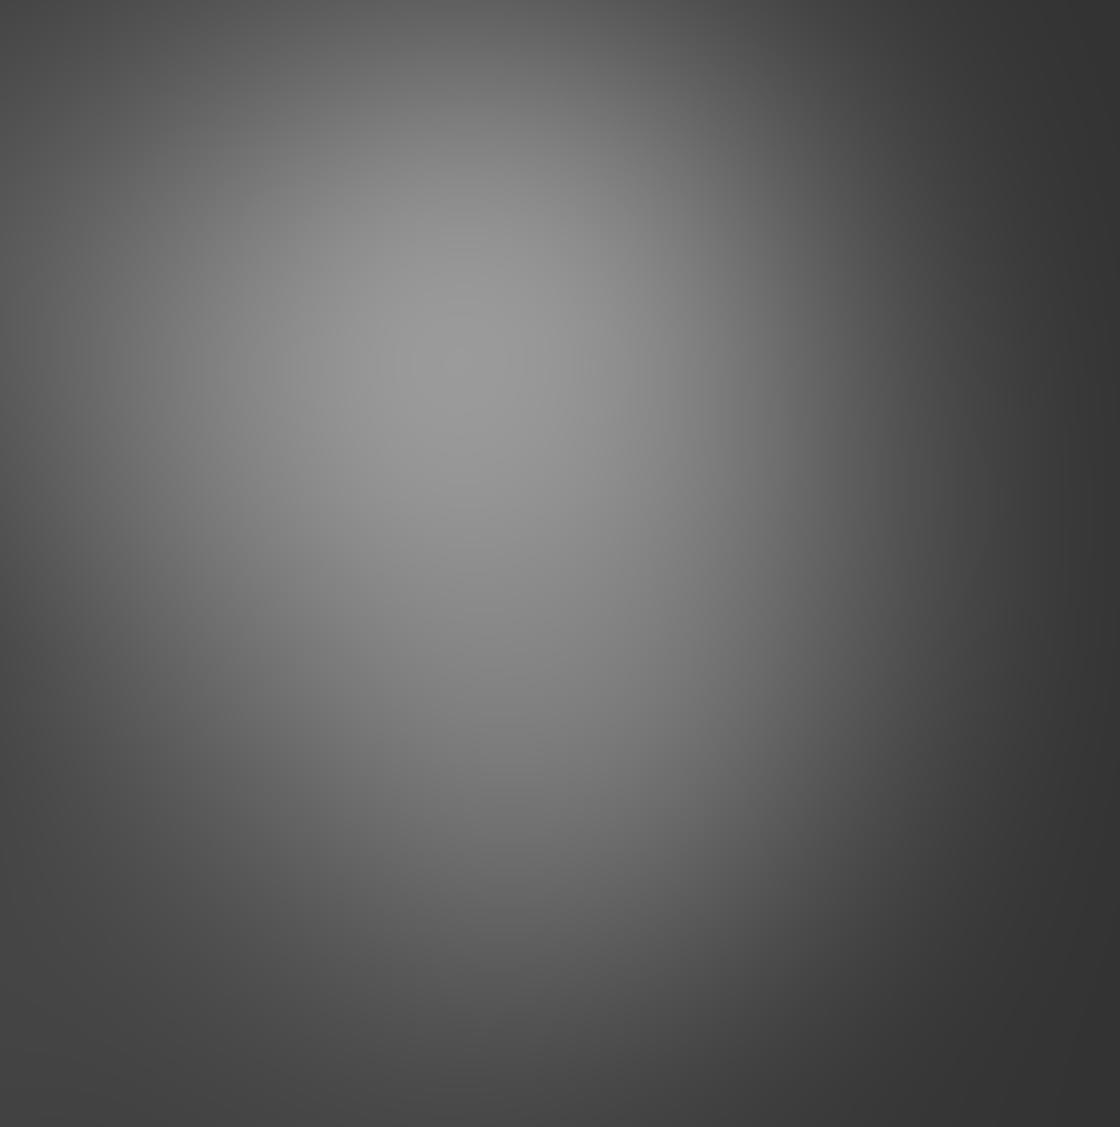 Vsco filters 20